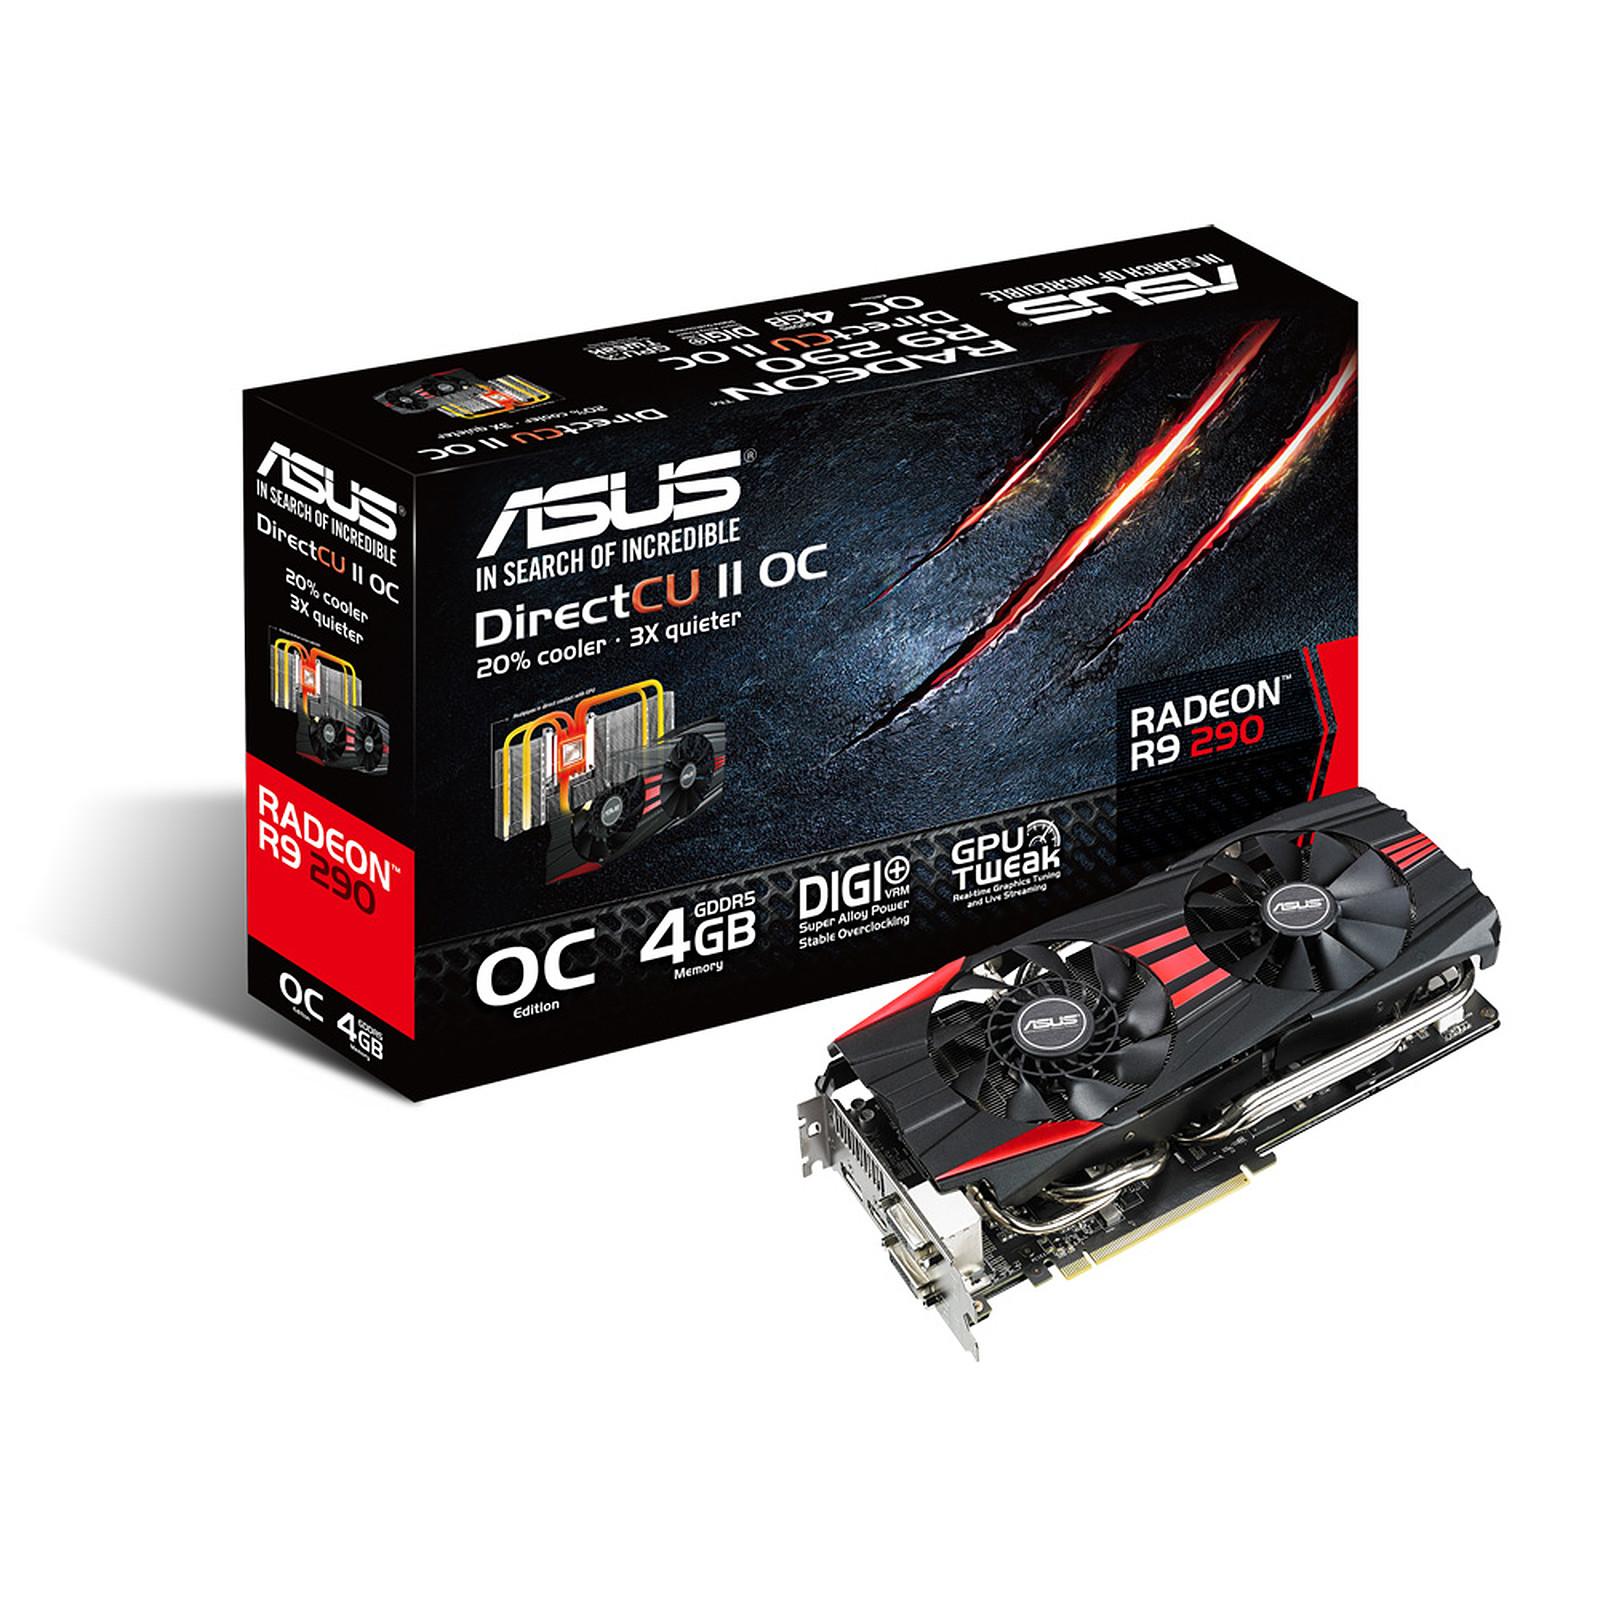 ASUS Radeon R9 290 R9290-DC2OC-4GD5